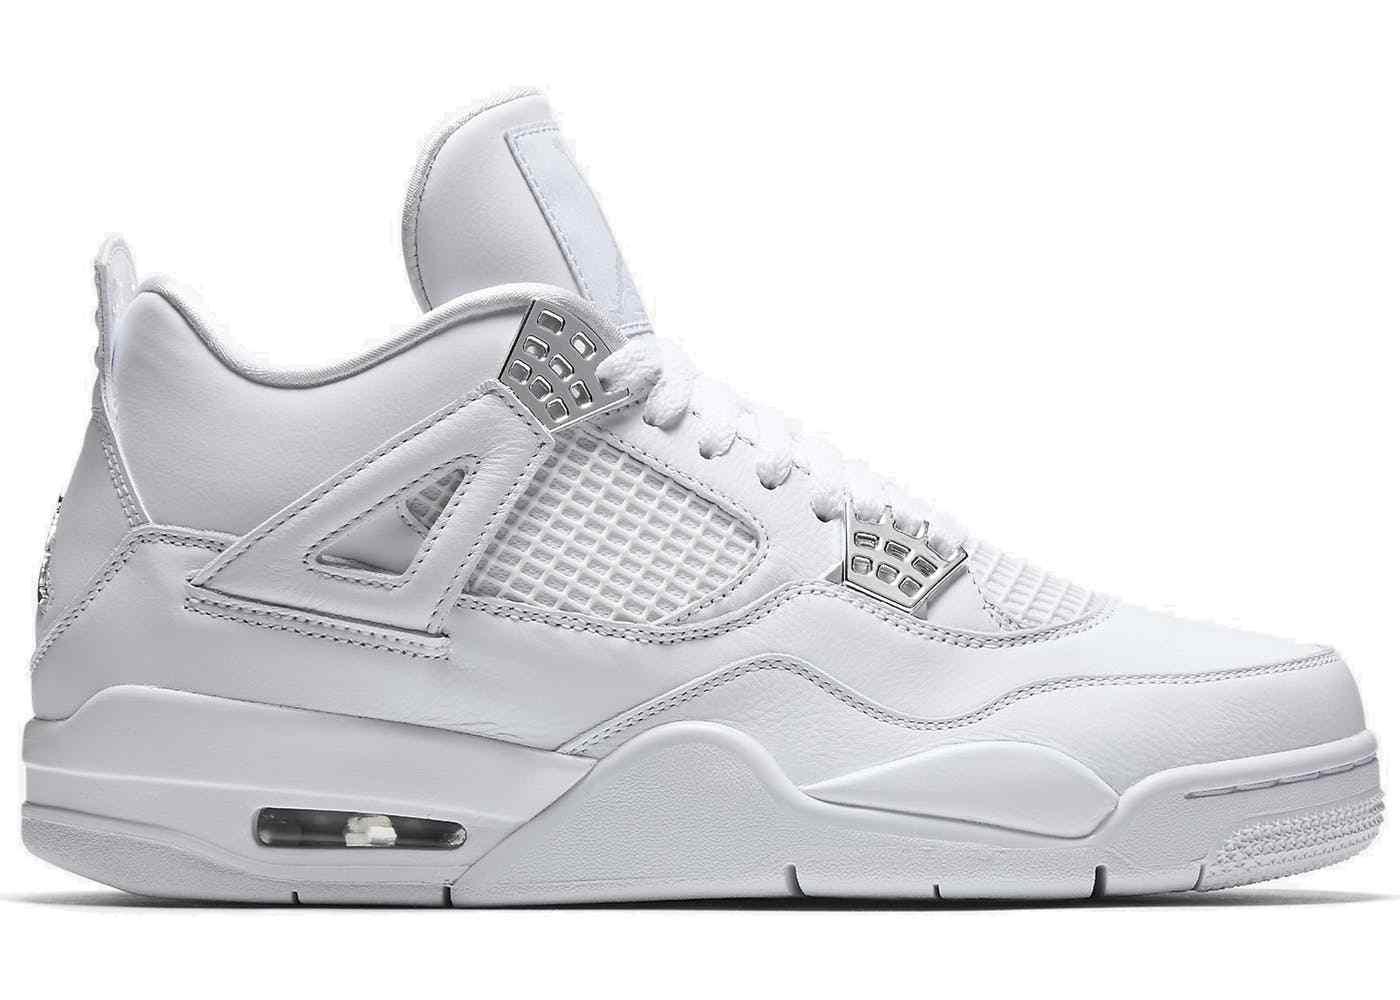 Mens Air Jordan 4 IV Pure Money White metallic Silver 308497-100 size 8-13